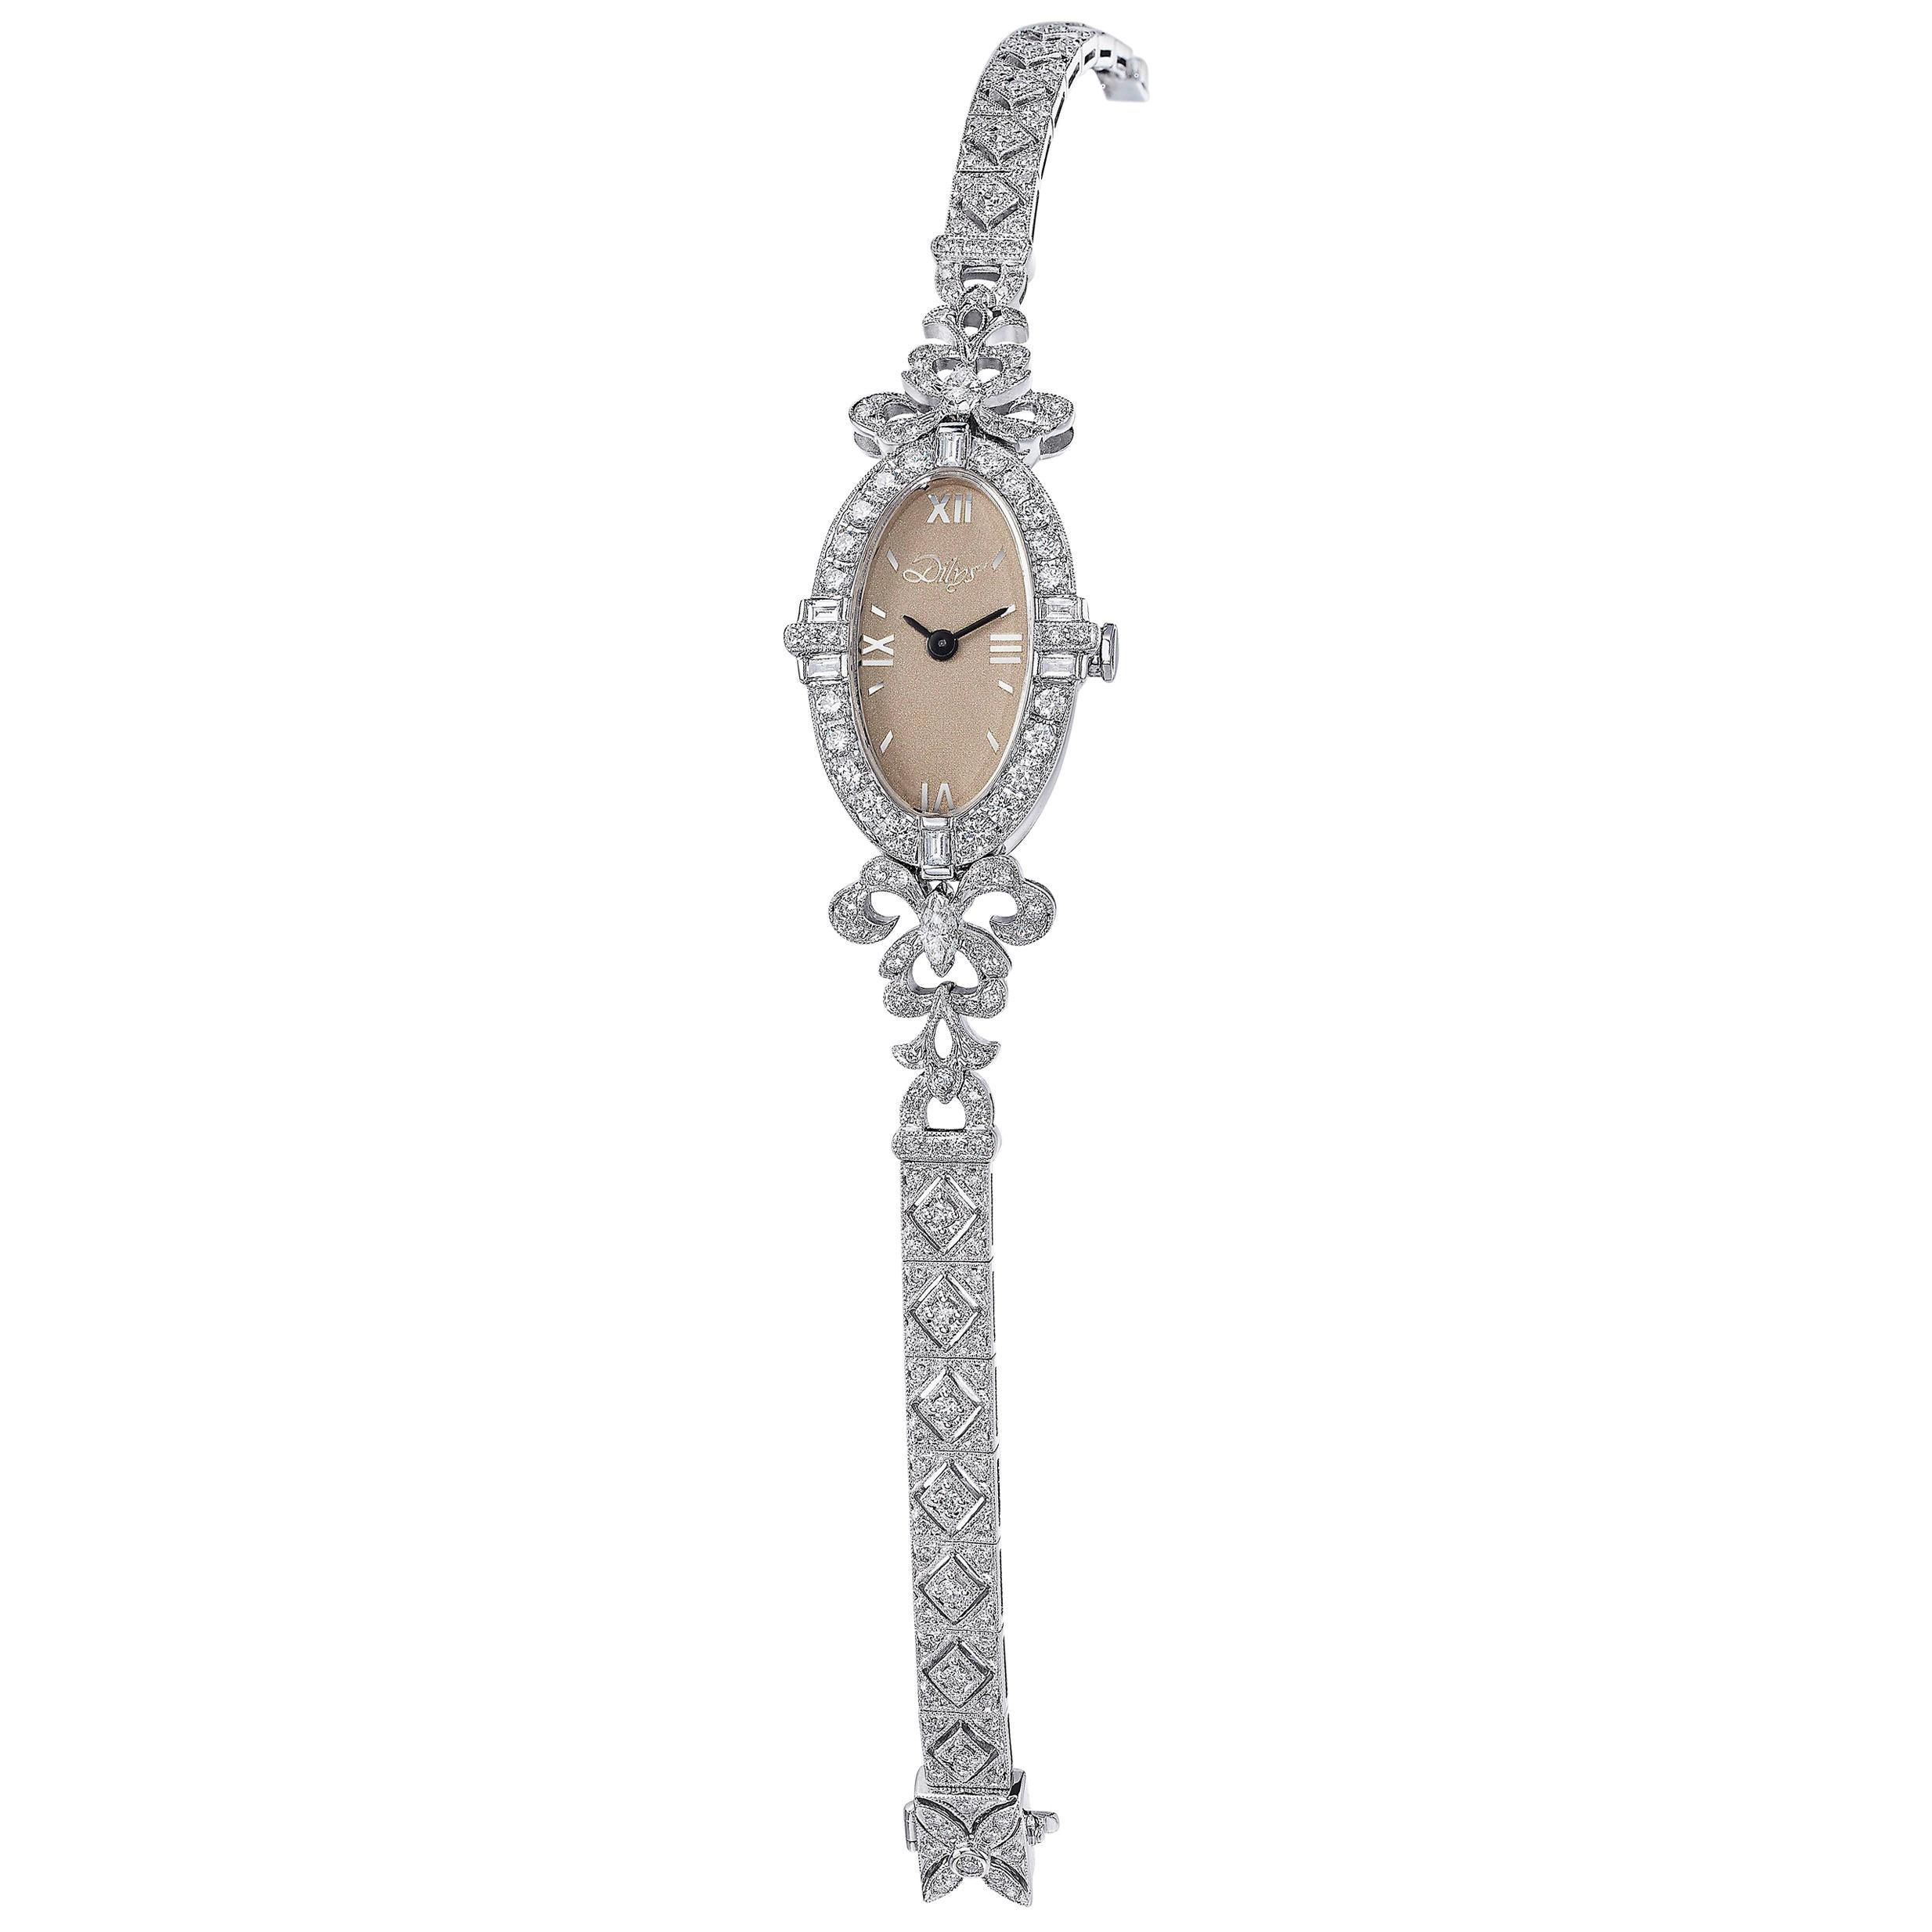 Art Deco Inspired Diamond Swiss Quartz Movement Watch in 18 Karat Gold